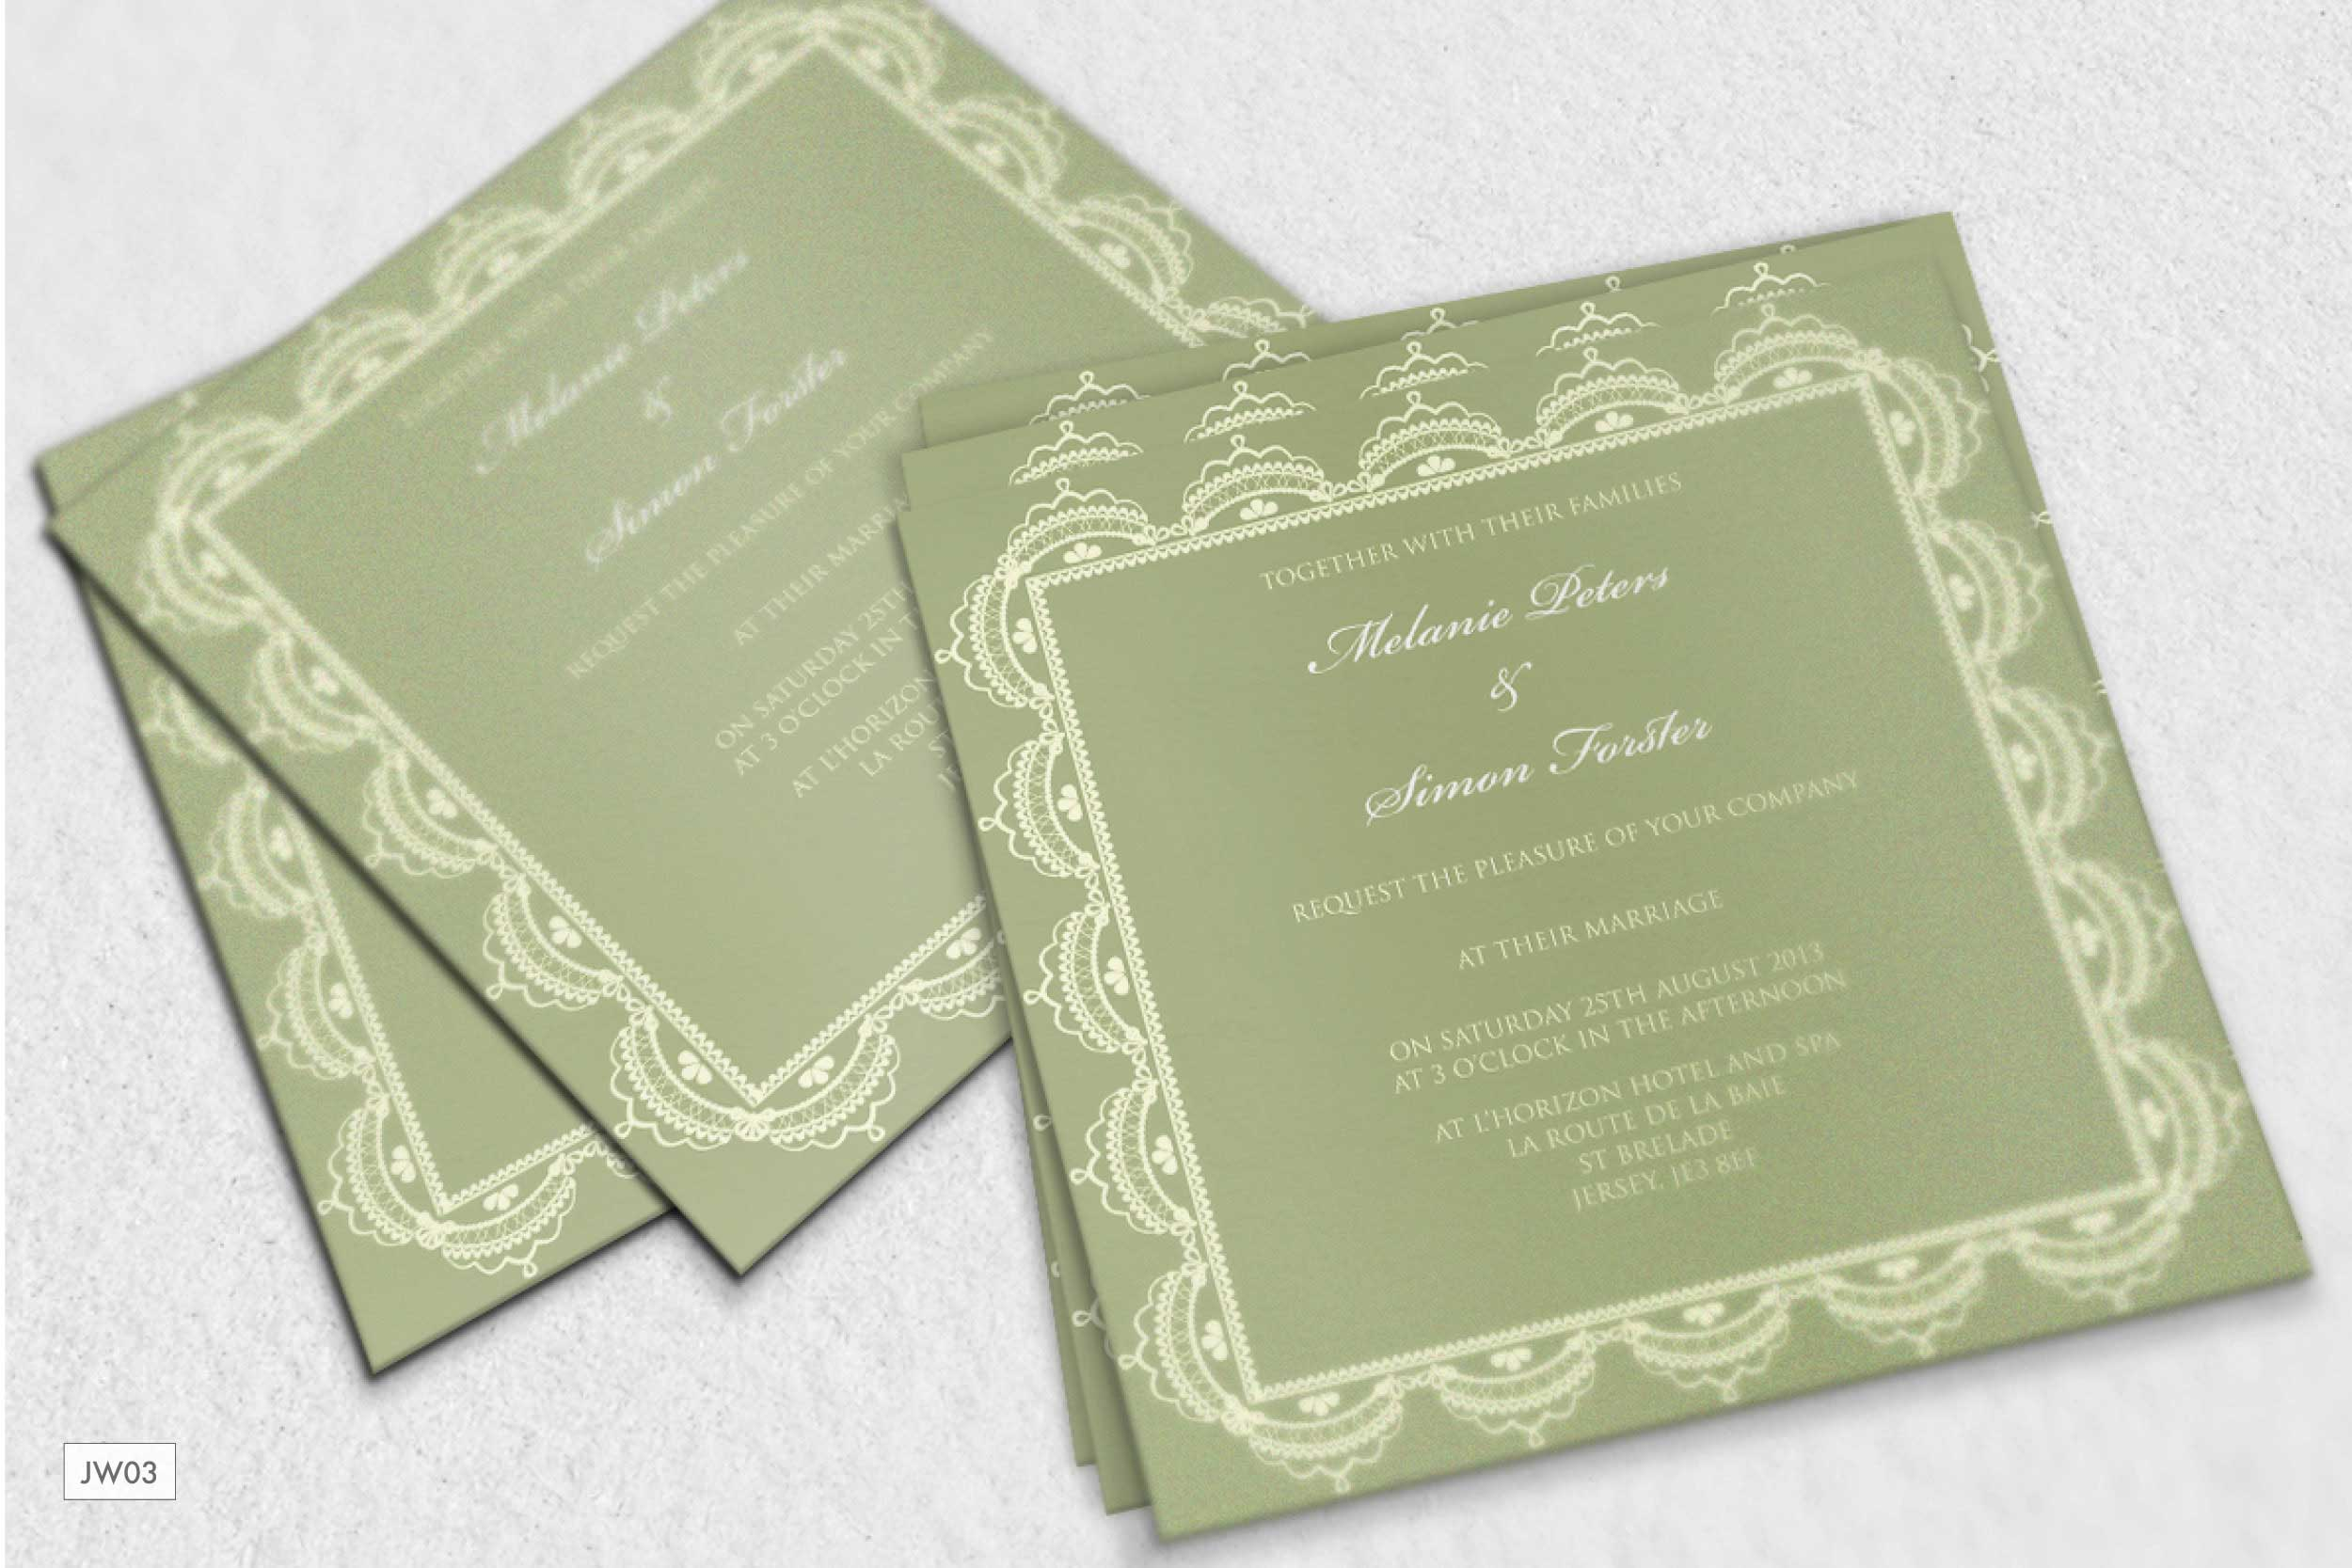 green-lace_Menu_jersey_weddings_ananyacards.com_01.jpg